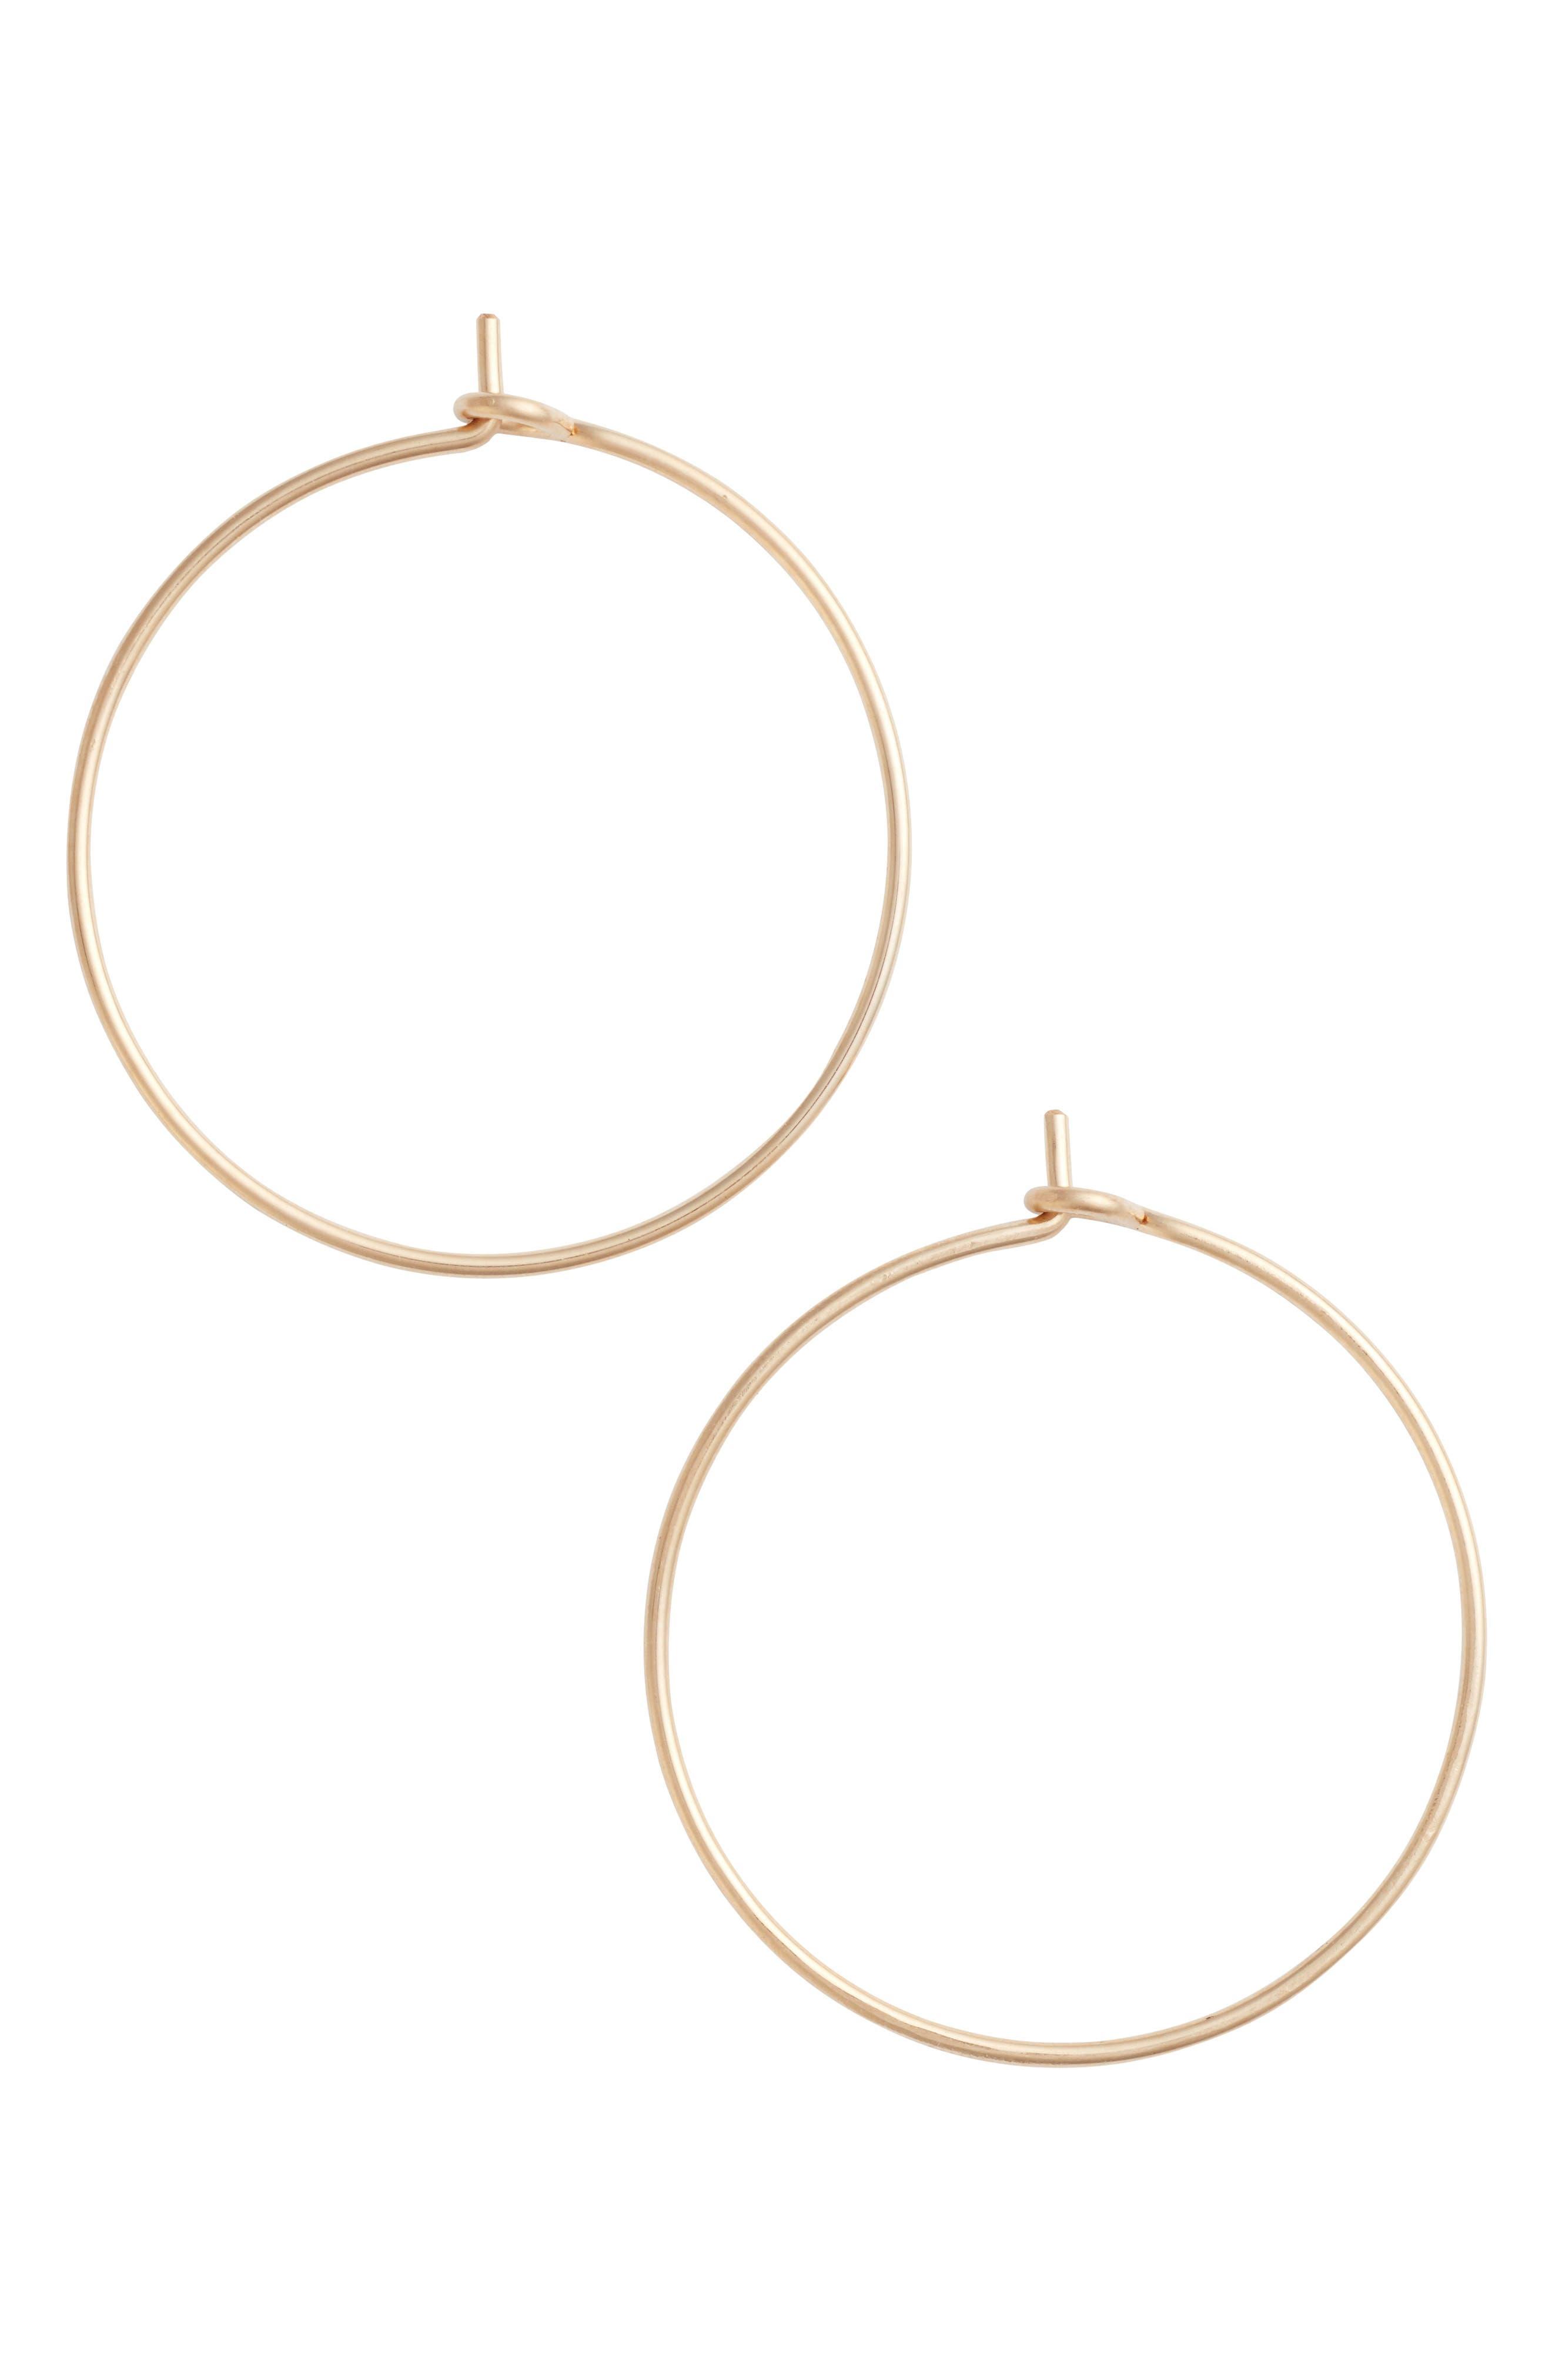 Main Image - Nashelle Medium Pure Hoop Earrings